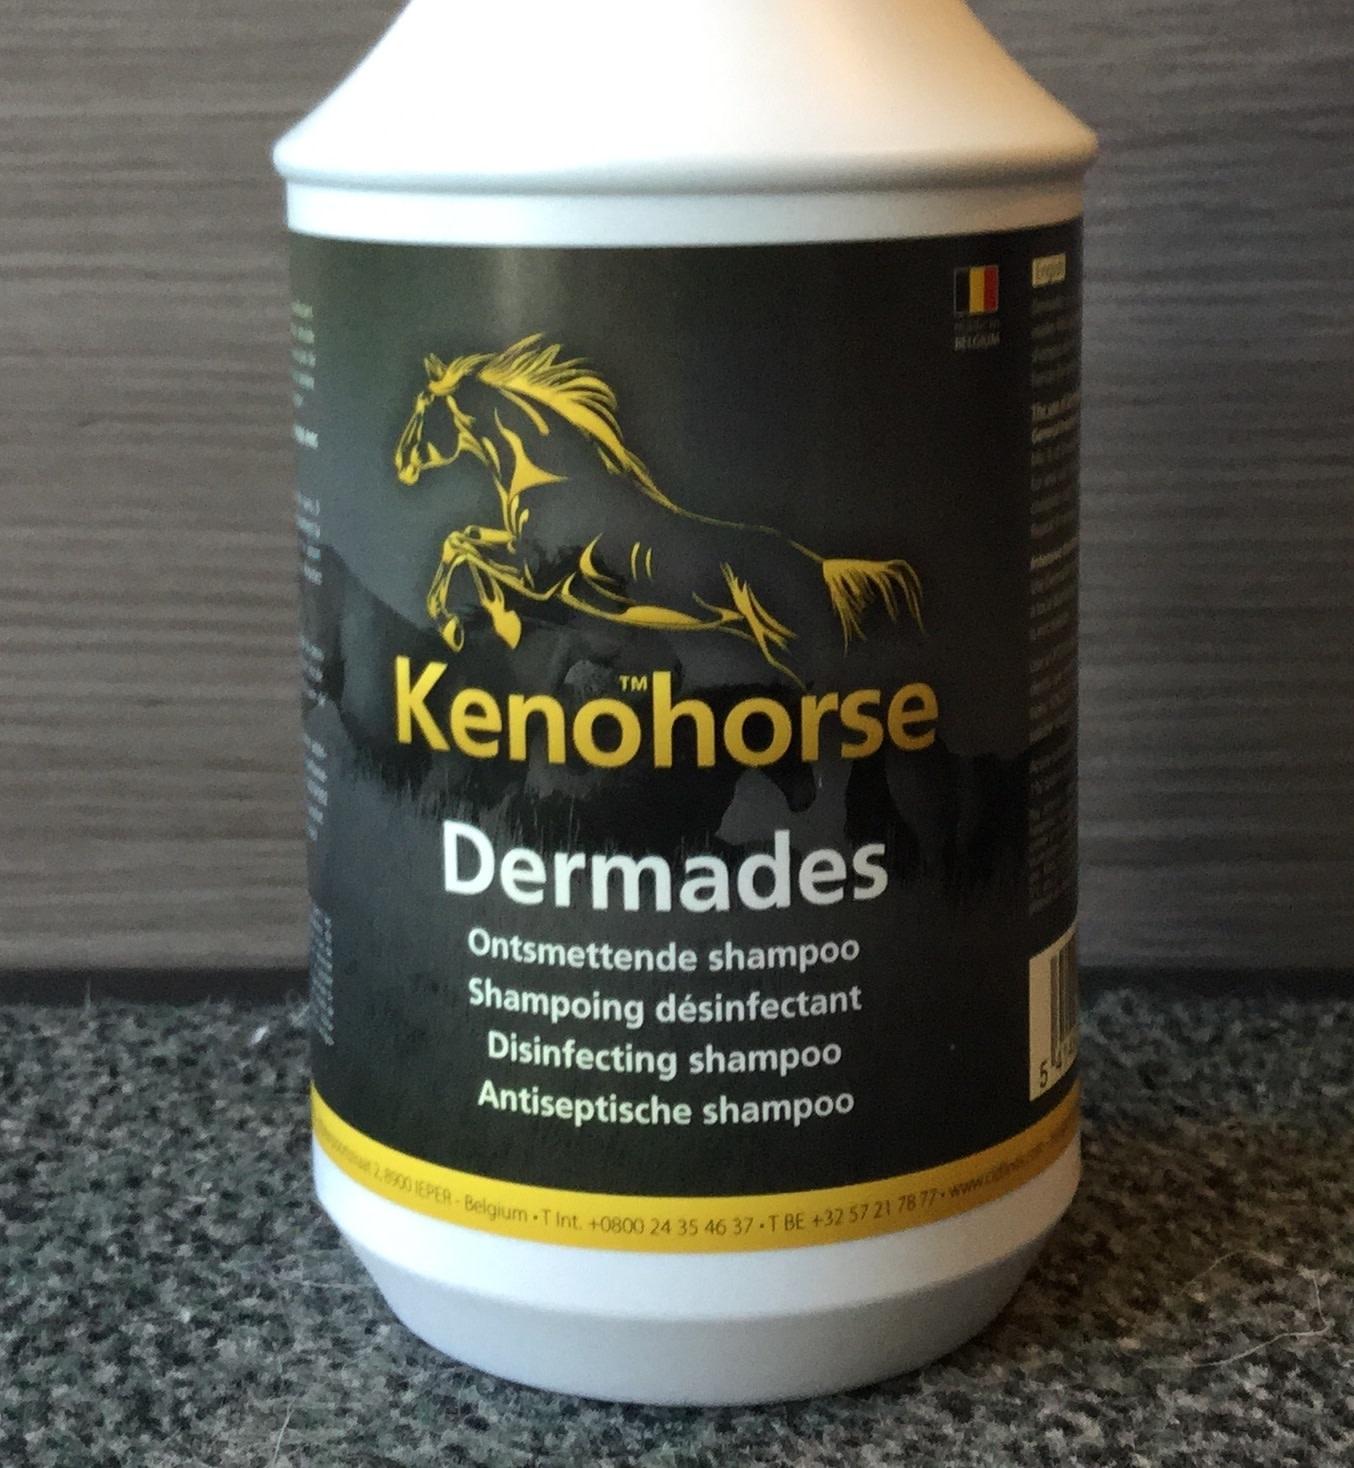 KENOHORSE Dermades ontsmettende shampoo